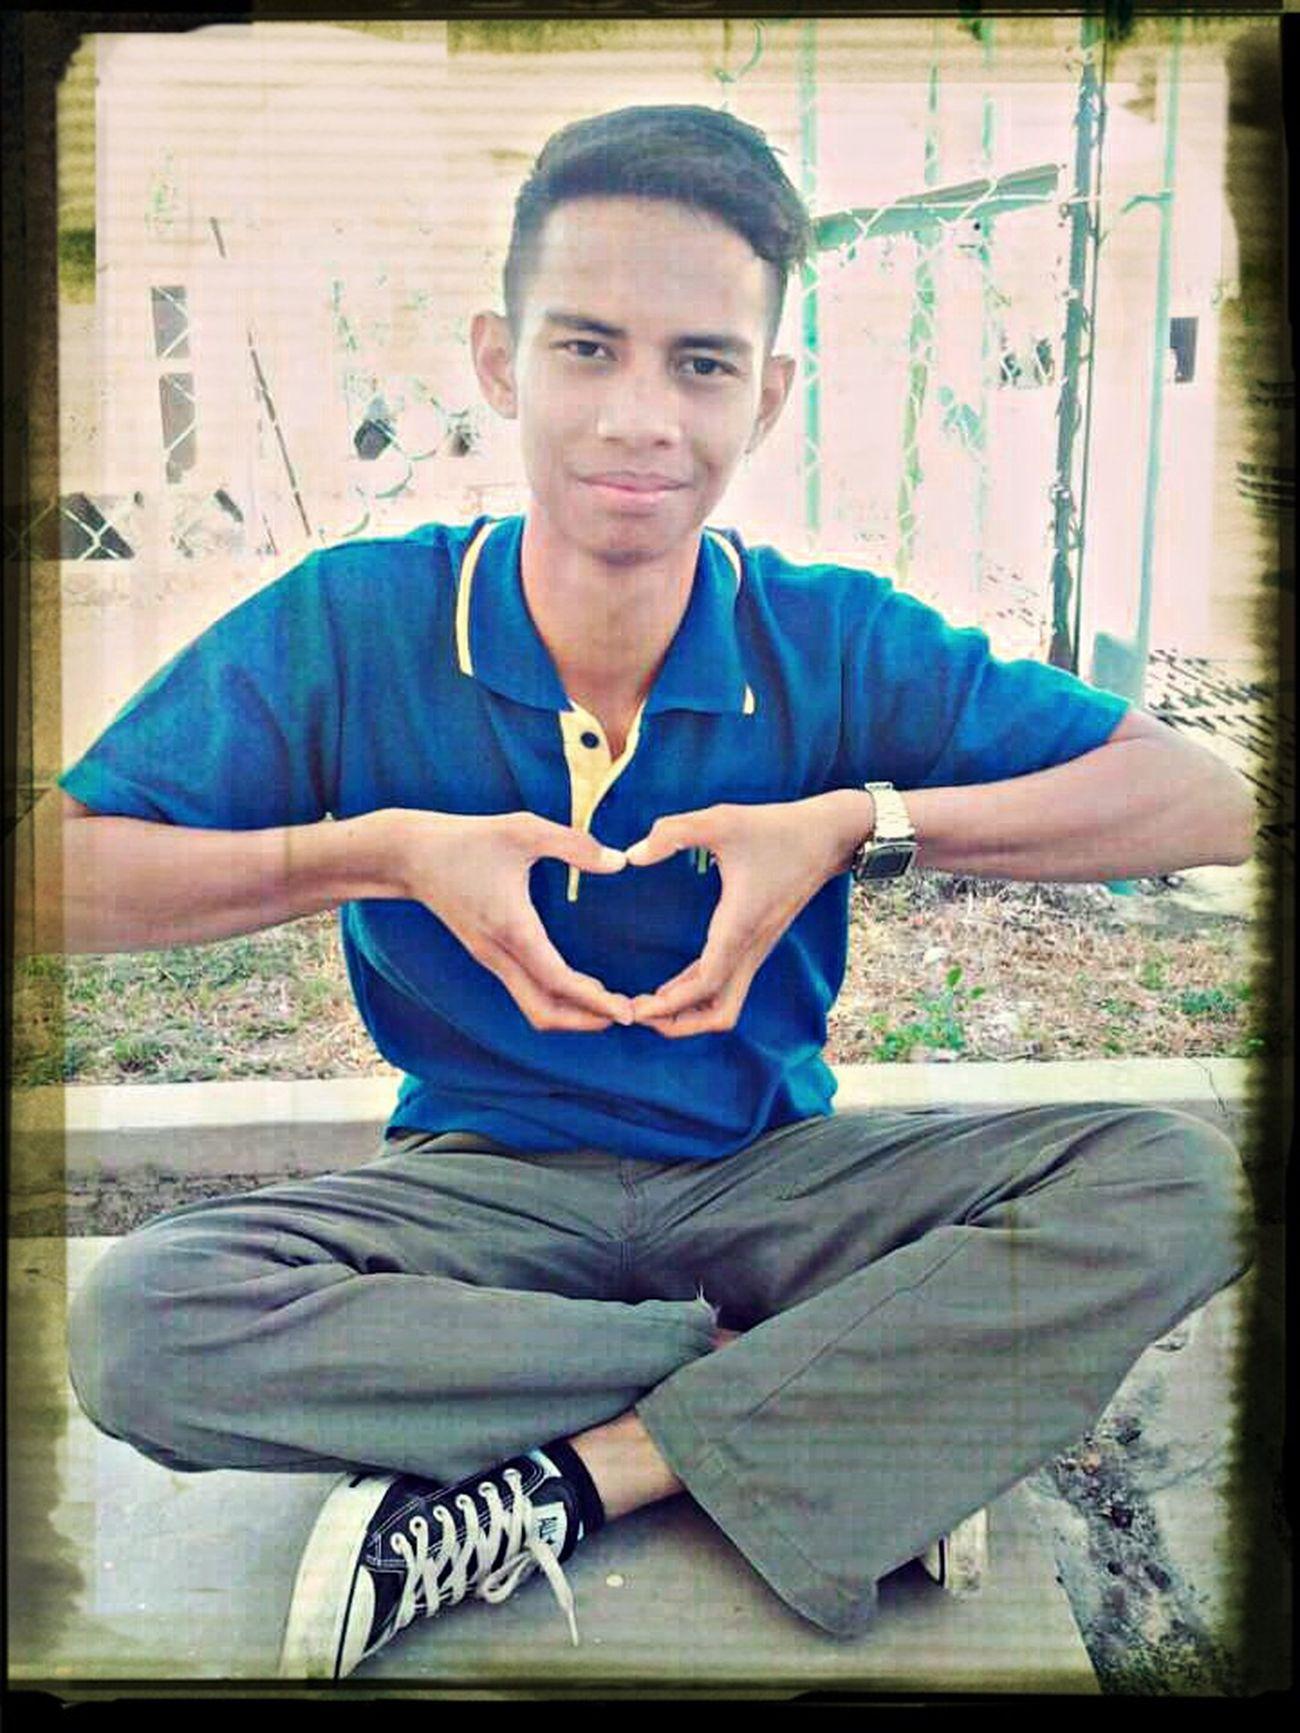 Do you love me? Love♥ Single Needlove